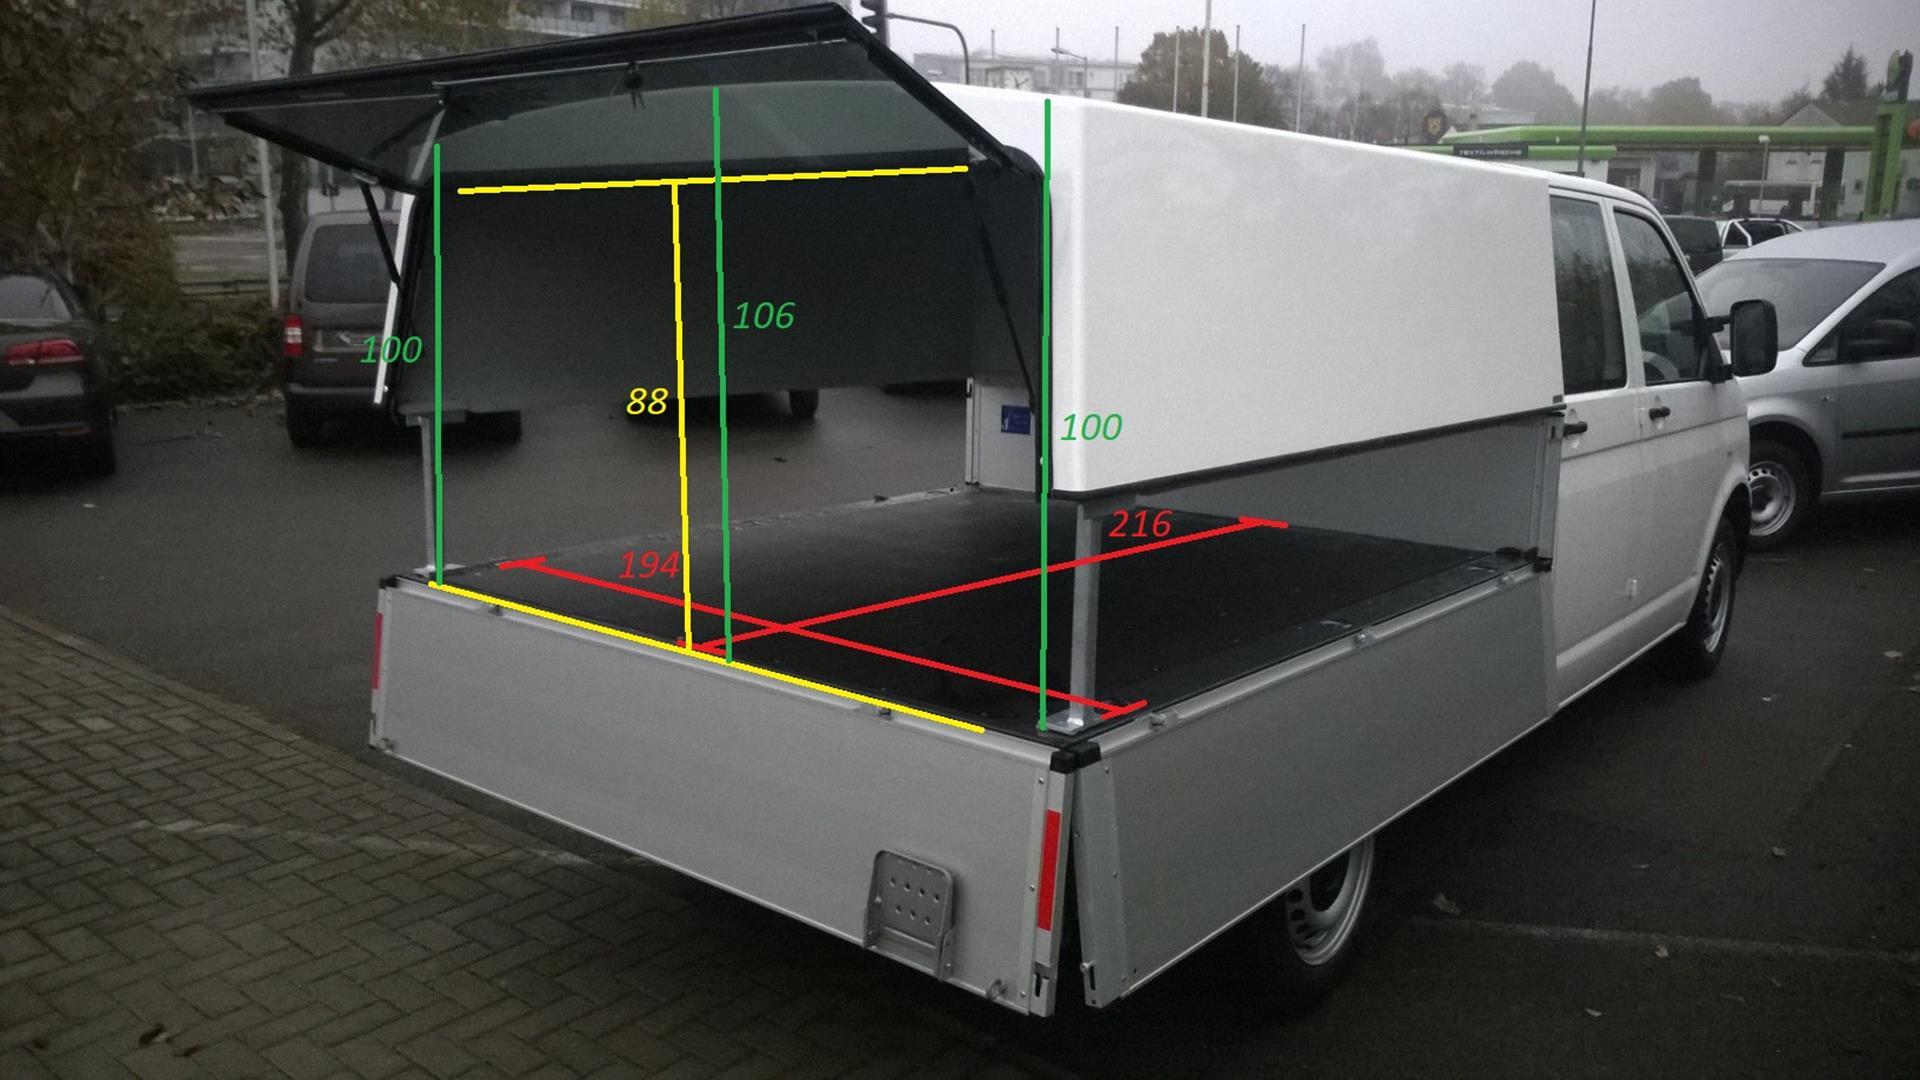 Beltop Hardtop Classic für VW Bus T5 Doppelkabine Pritsche passend für VW  T5